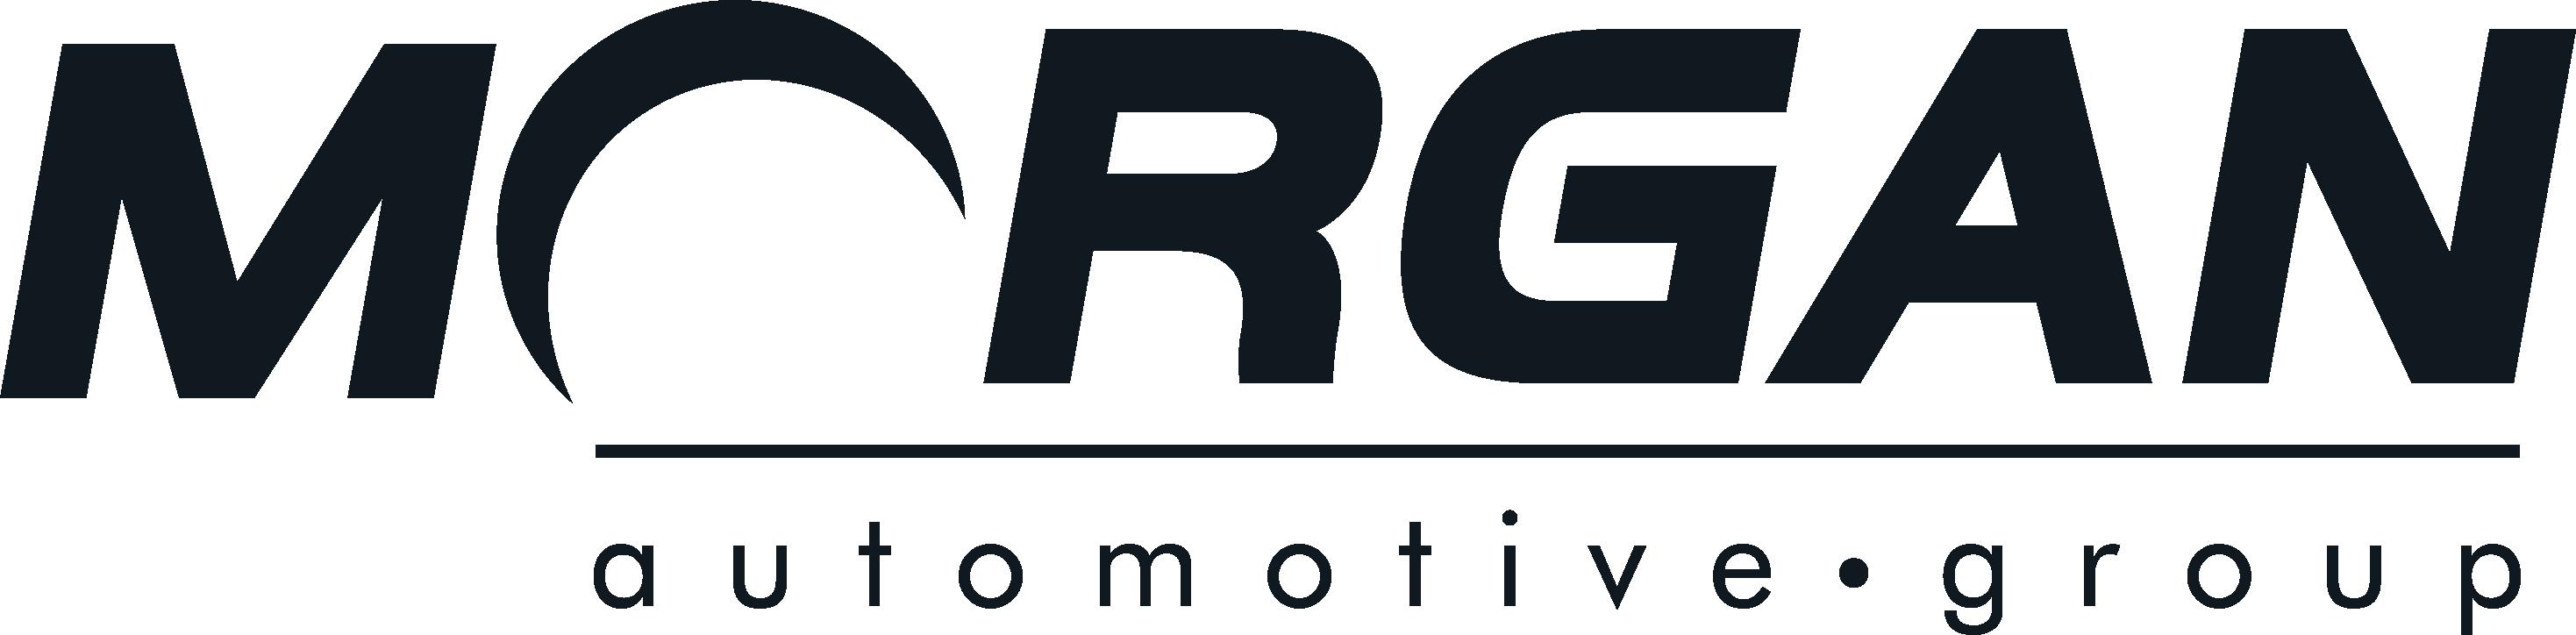 Romph Pou Full-Service Marketing Agency for Automotive